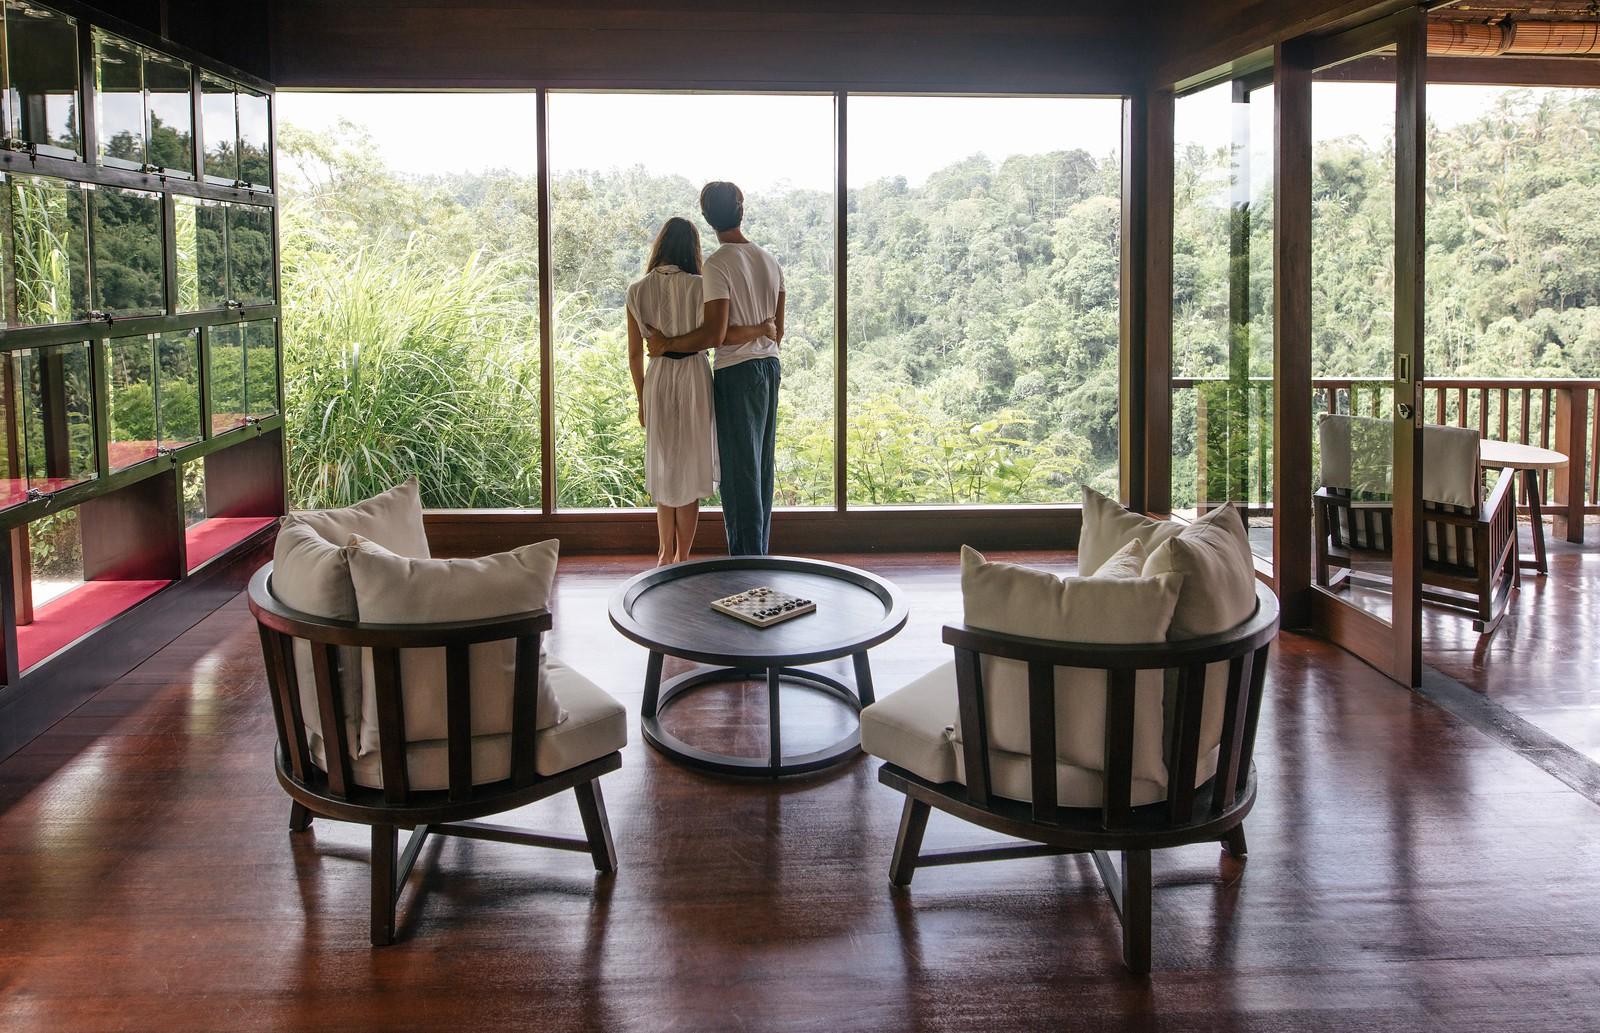 https://www.otdesign.com/wp-content/uploads/2020/11/OTdesign_Hanging_Gardens_Bali-mwxjx8f-x3.jpg